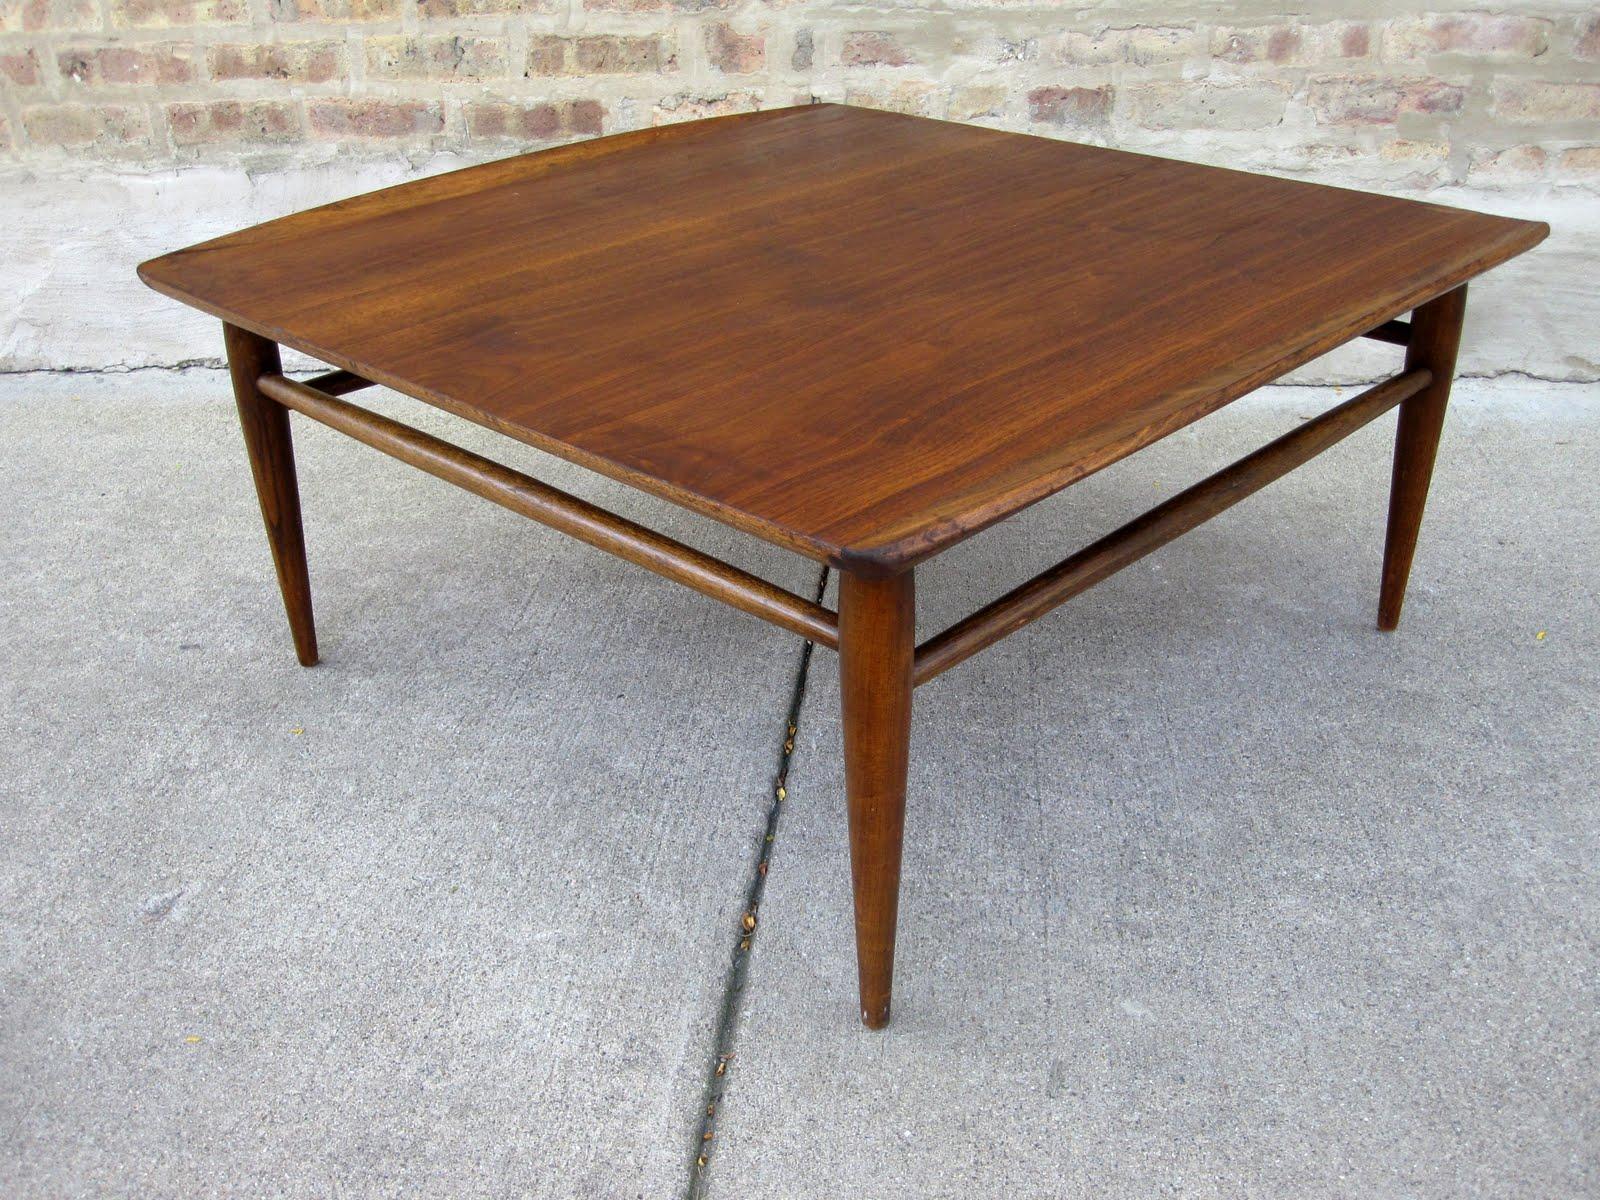 circa midcentury bassett walnut coffee table